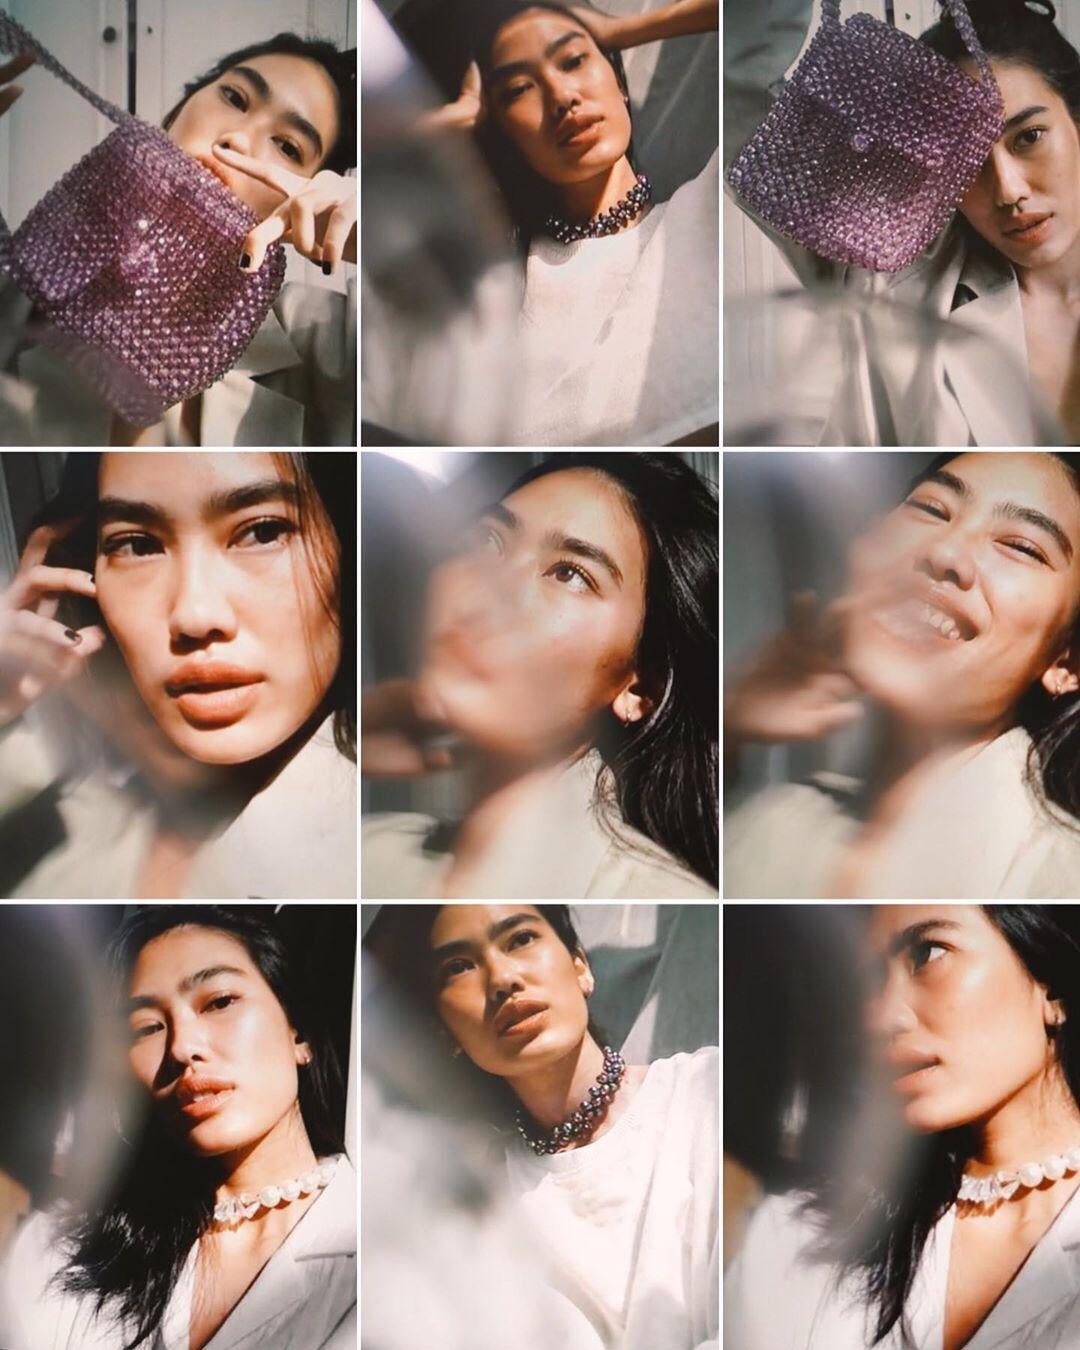 Ikut Trend Virtual Photoshoot, Ini Potret Keren Selebgram Indonesia